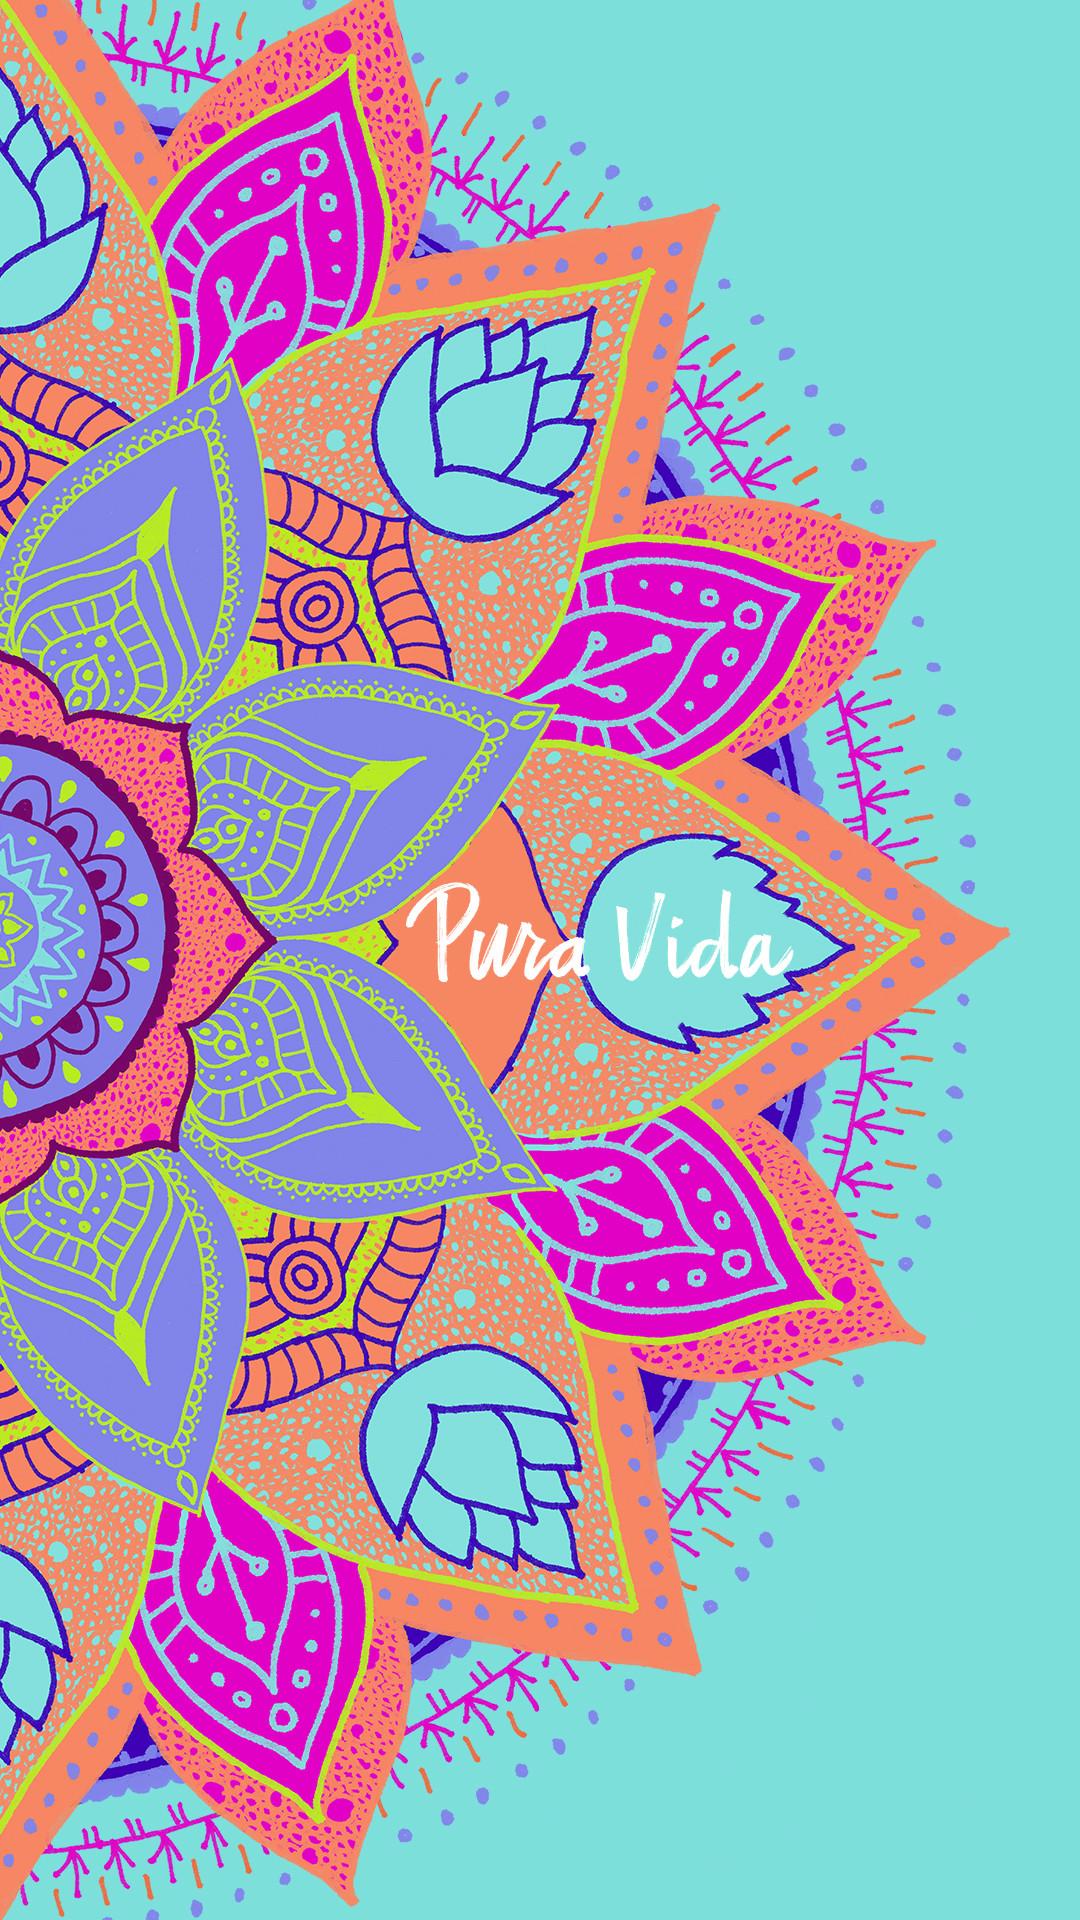 I really like this mandala's wallpaper